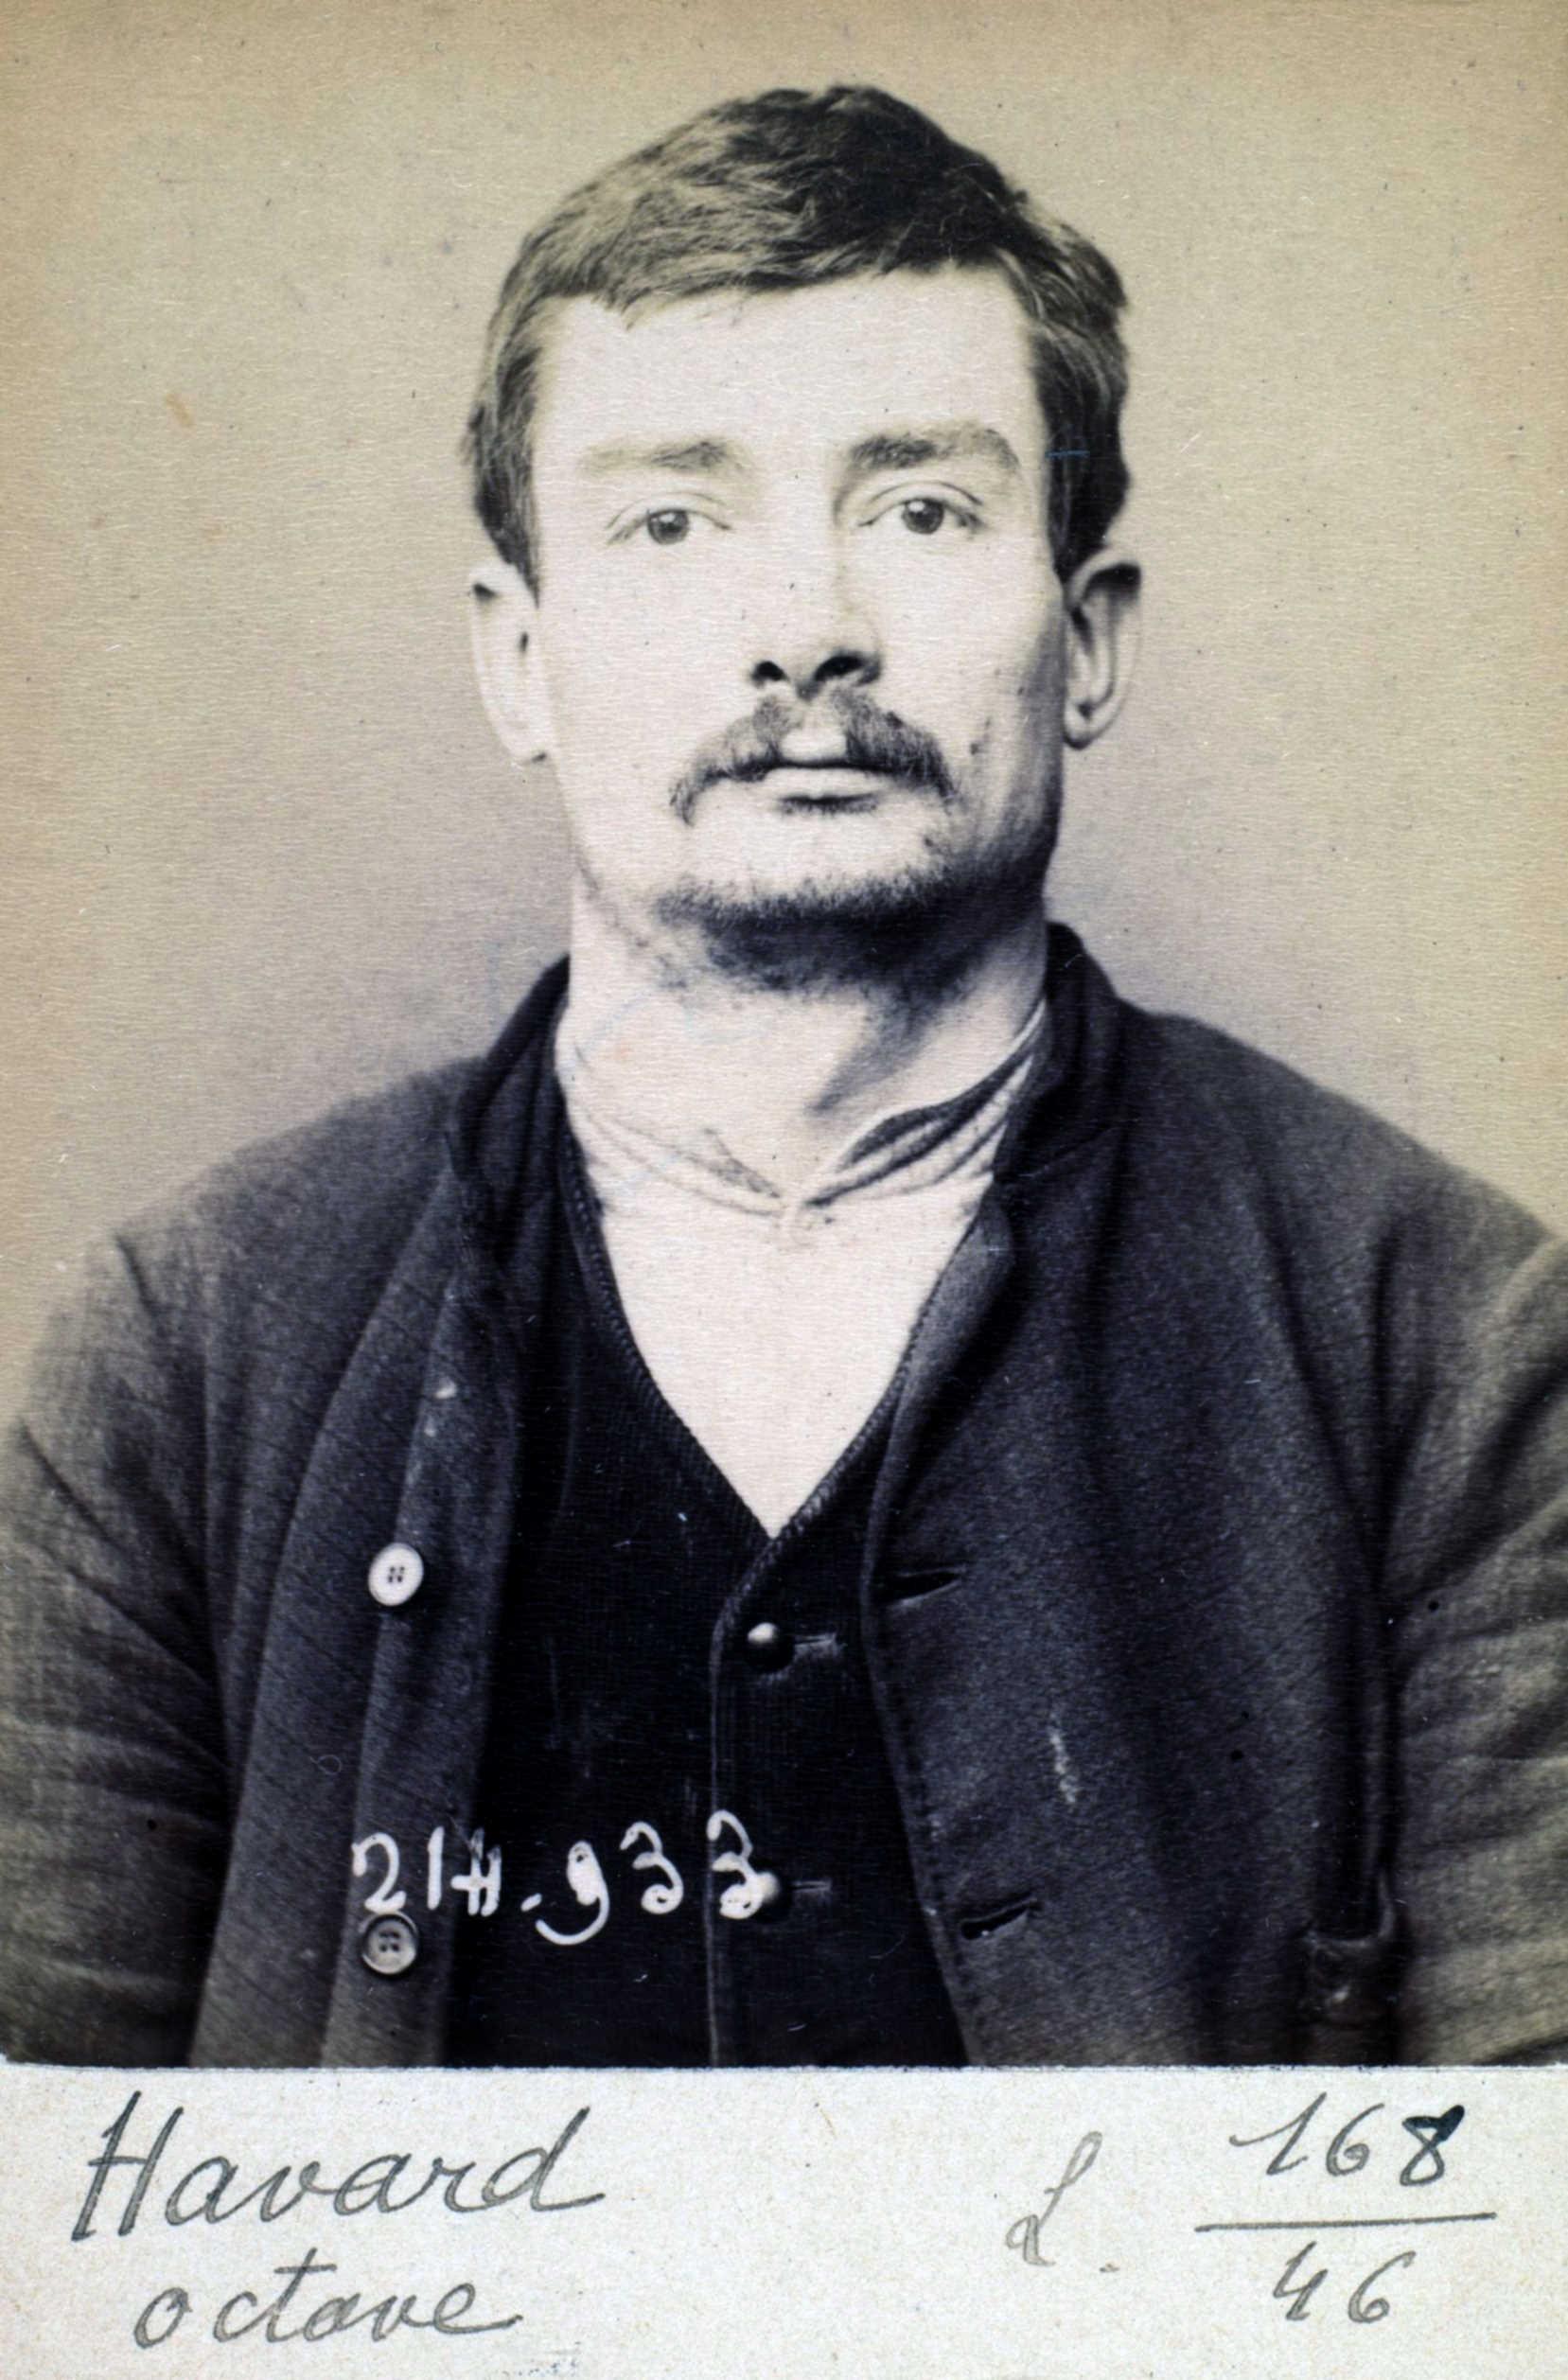 Foto policíaca d'Octave Havart (1 de març de 1894)